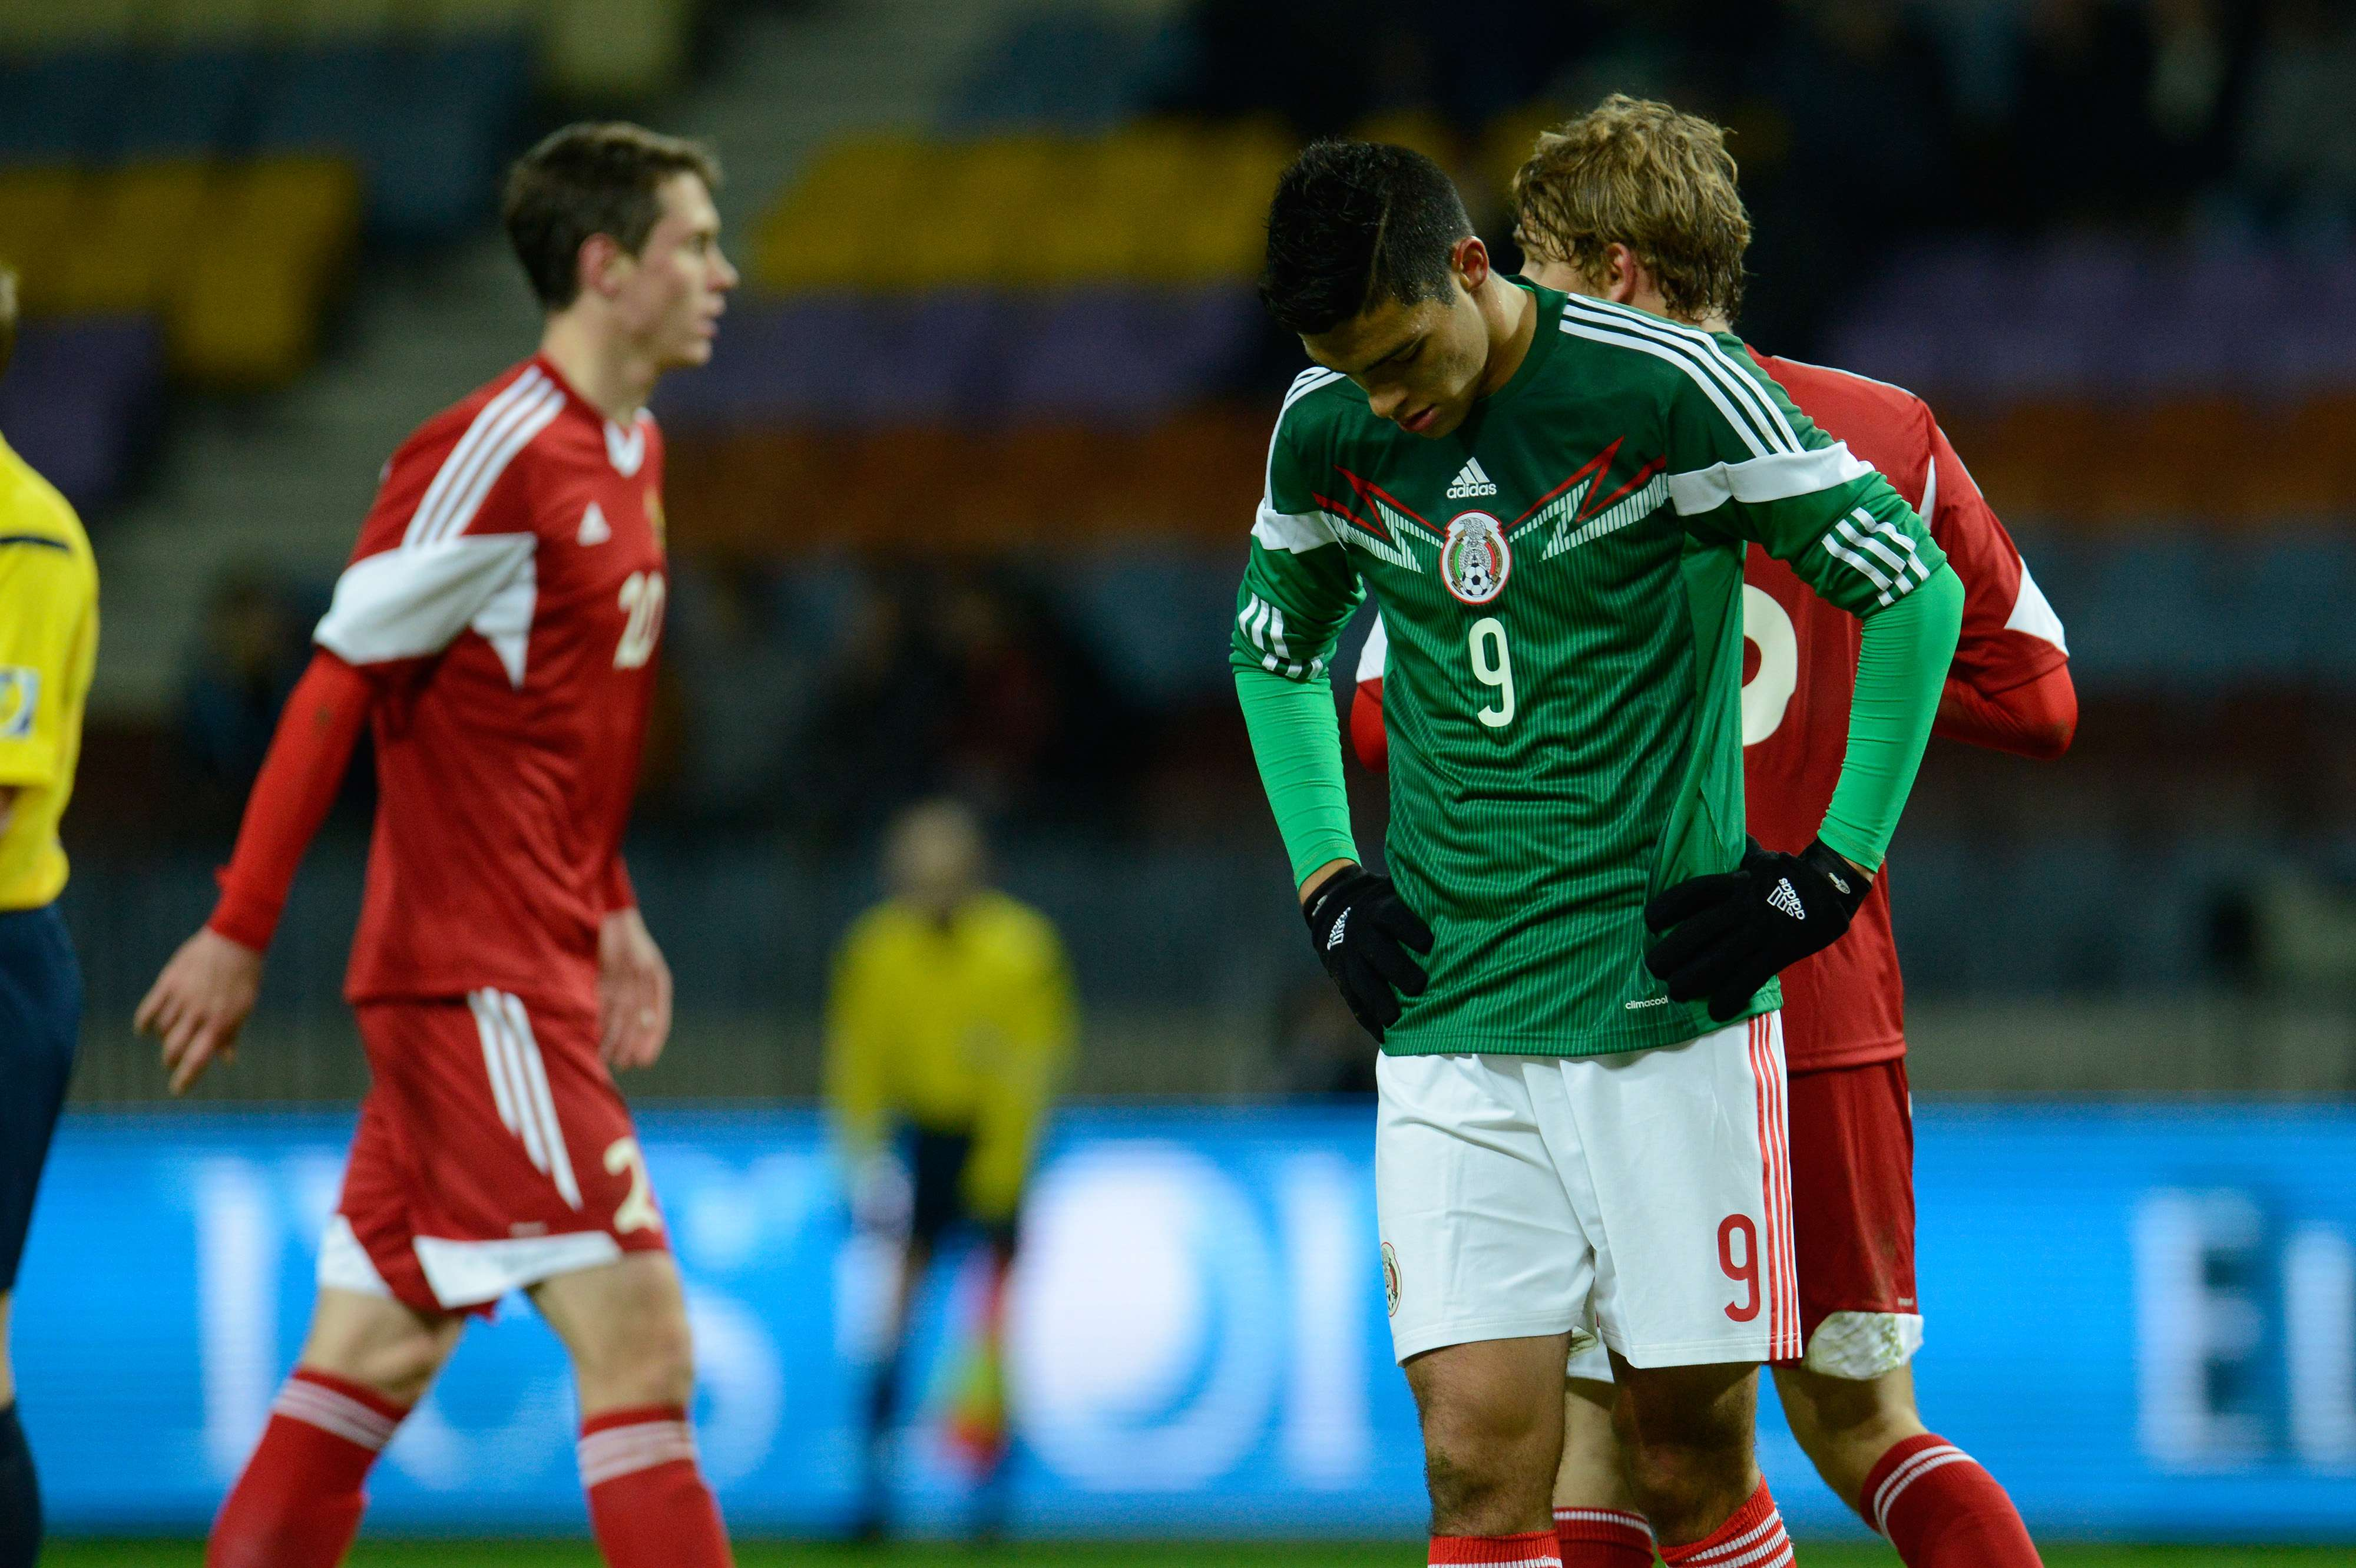 Raúl Jiménez marcó los dos goles en la derrota de México 3-2 ante Bielorrusia. Foto: Mexsport